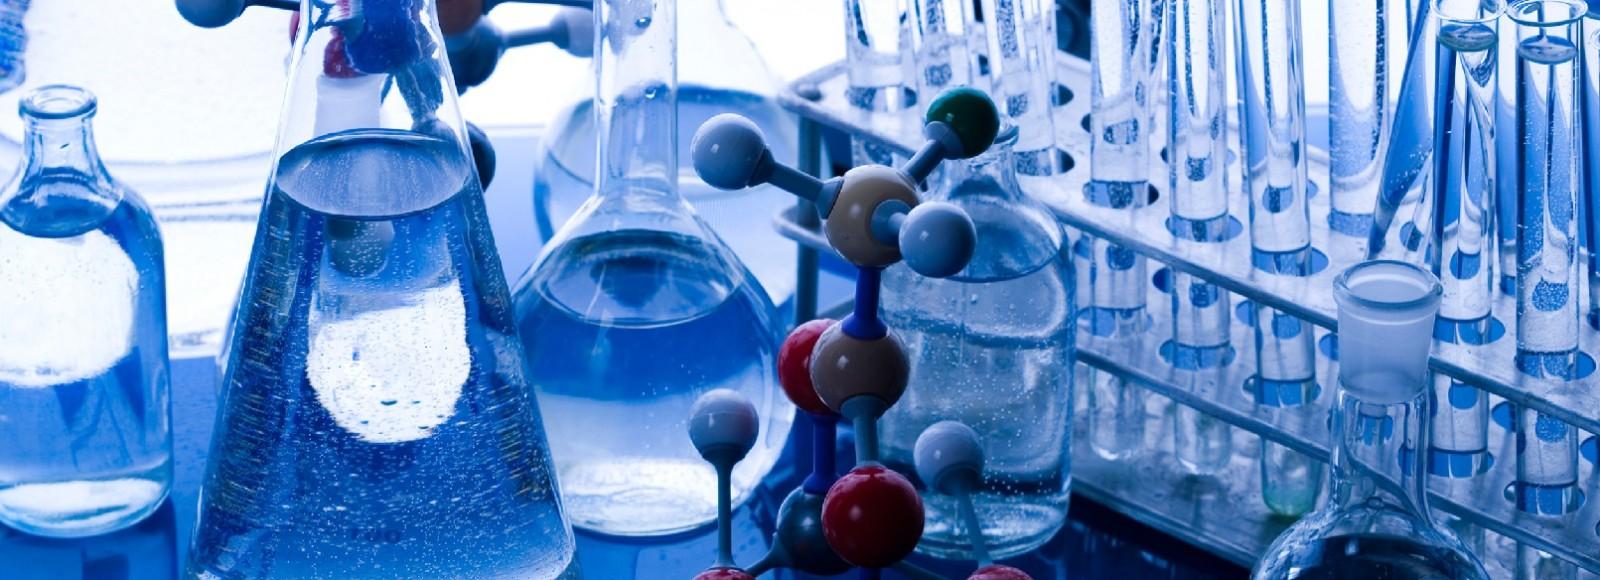 chemicalcheck_laborbild